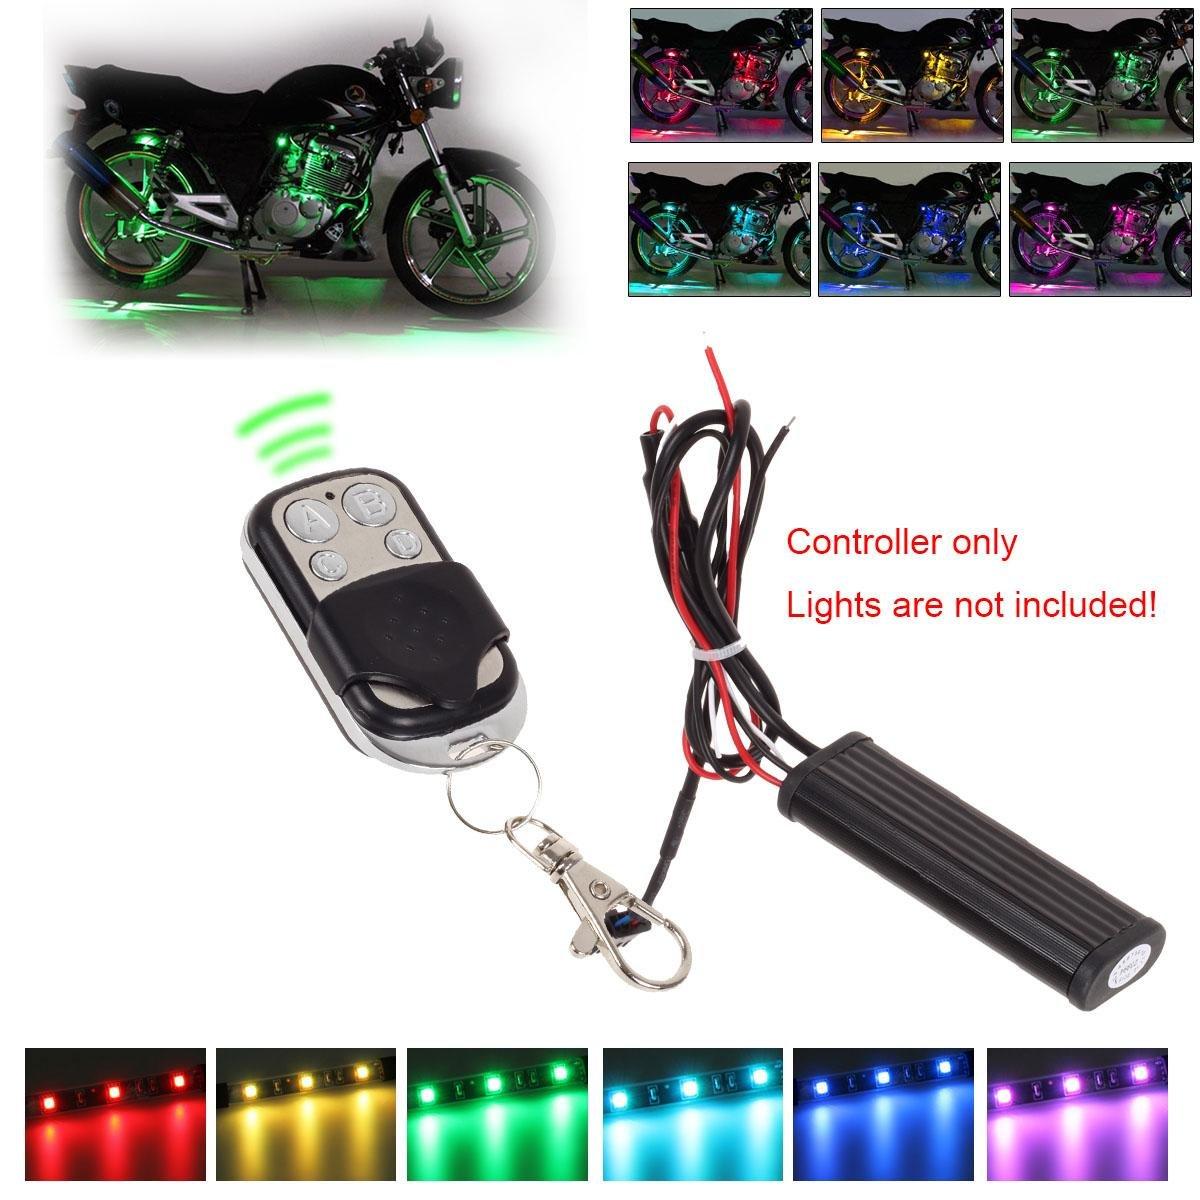 Partsam Wireless Remote Controller Kit Multi-color RGB LED lights Controller for 12V Car Truck Motorcycles LED Strip Light Bar - Controller & Remote Only 129820